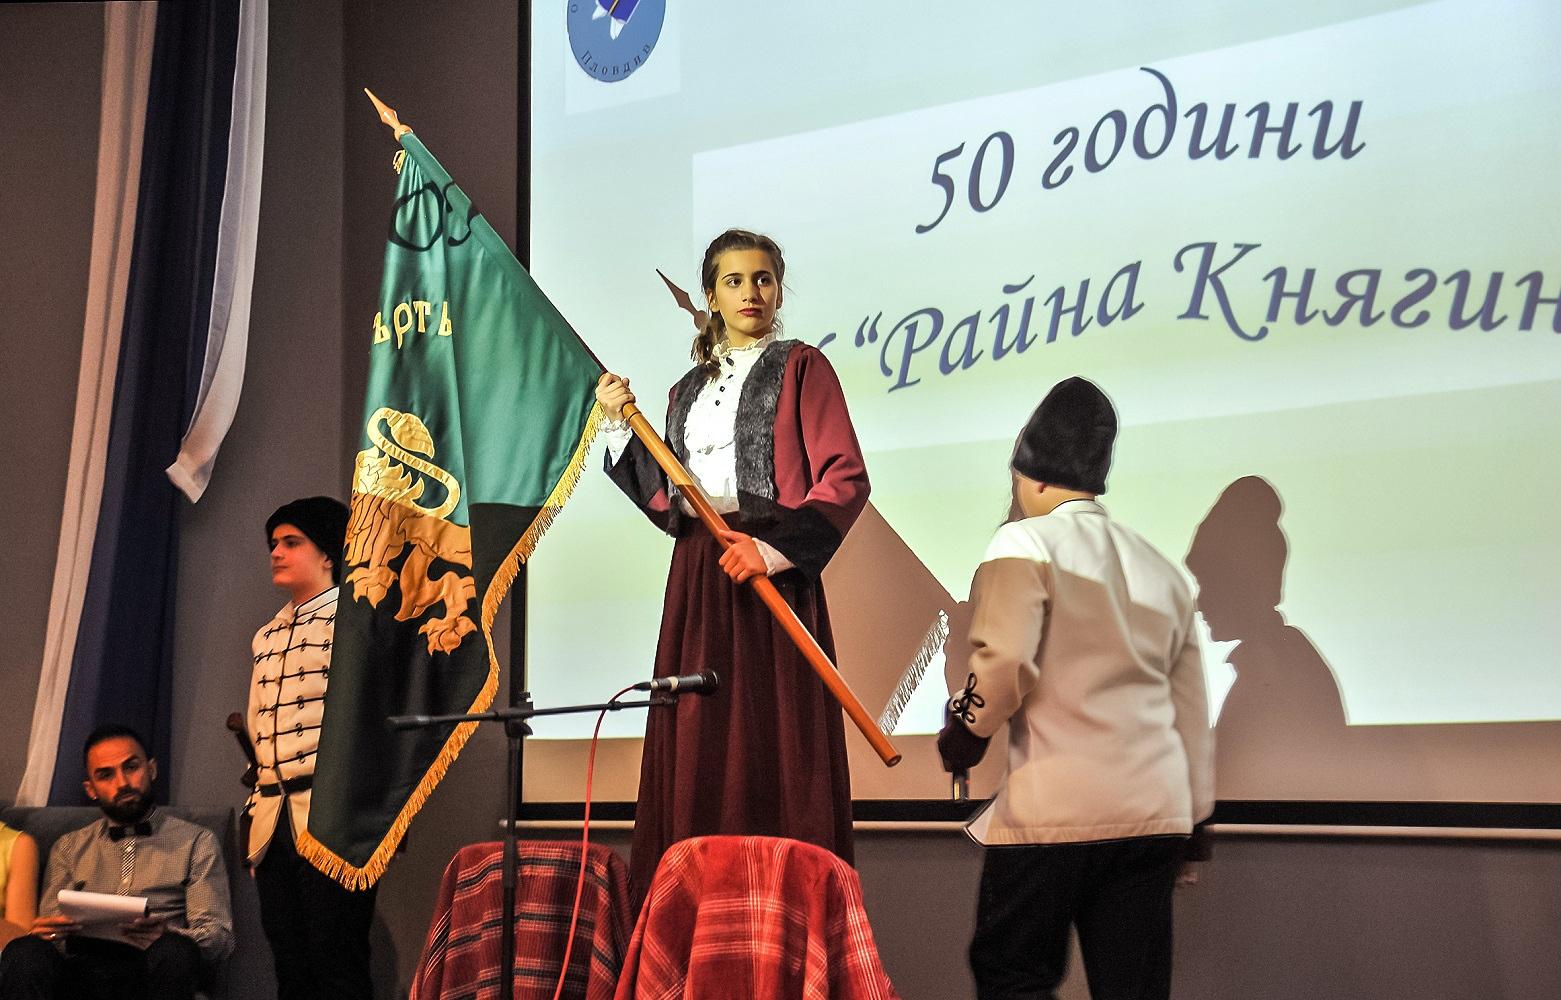 fg39-2020-patron-saint39-2020-patron-saint-40